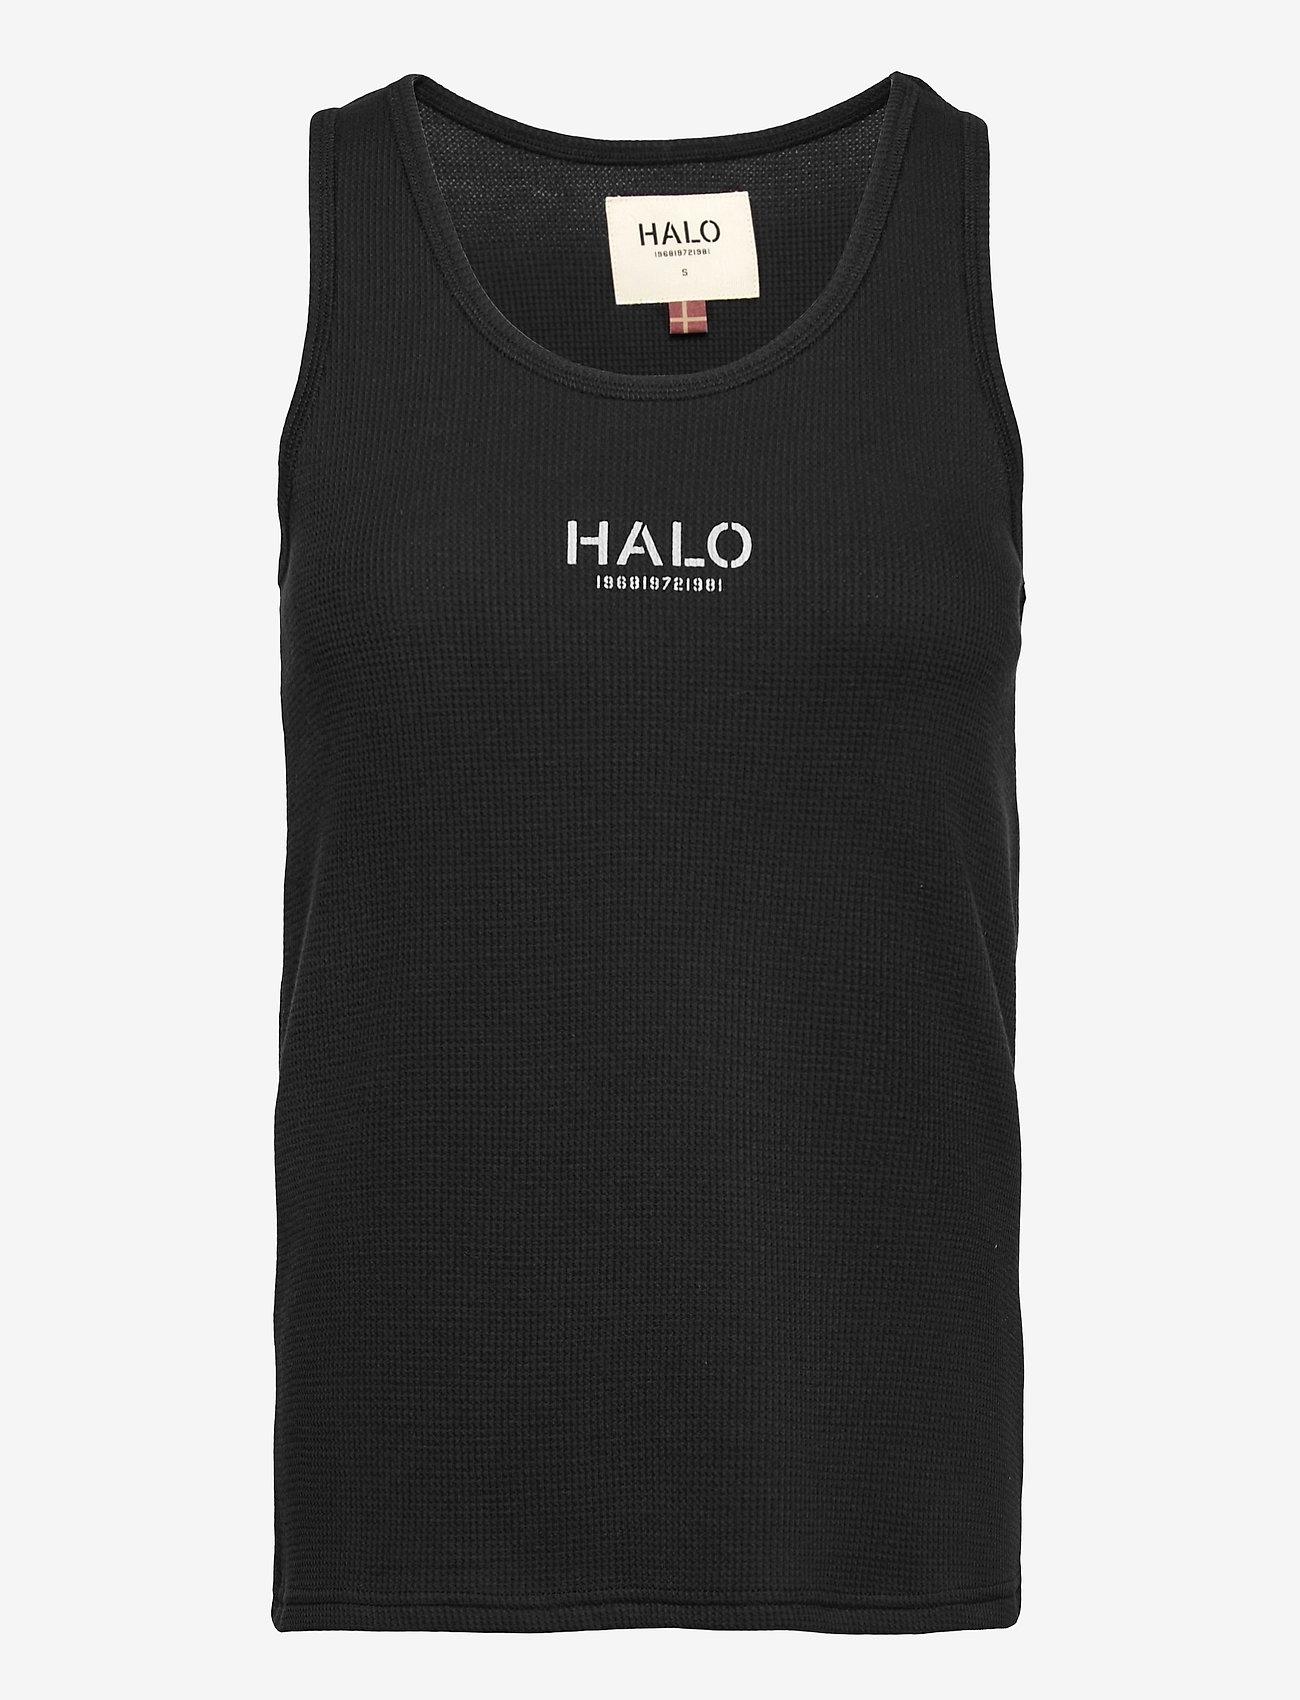 HALO - HALO WOMENS WAFFLE TANK - Ärmellose tops - black - 0